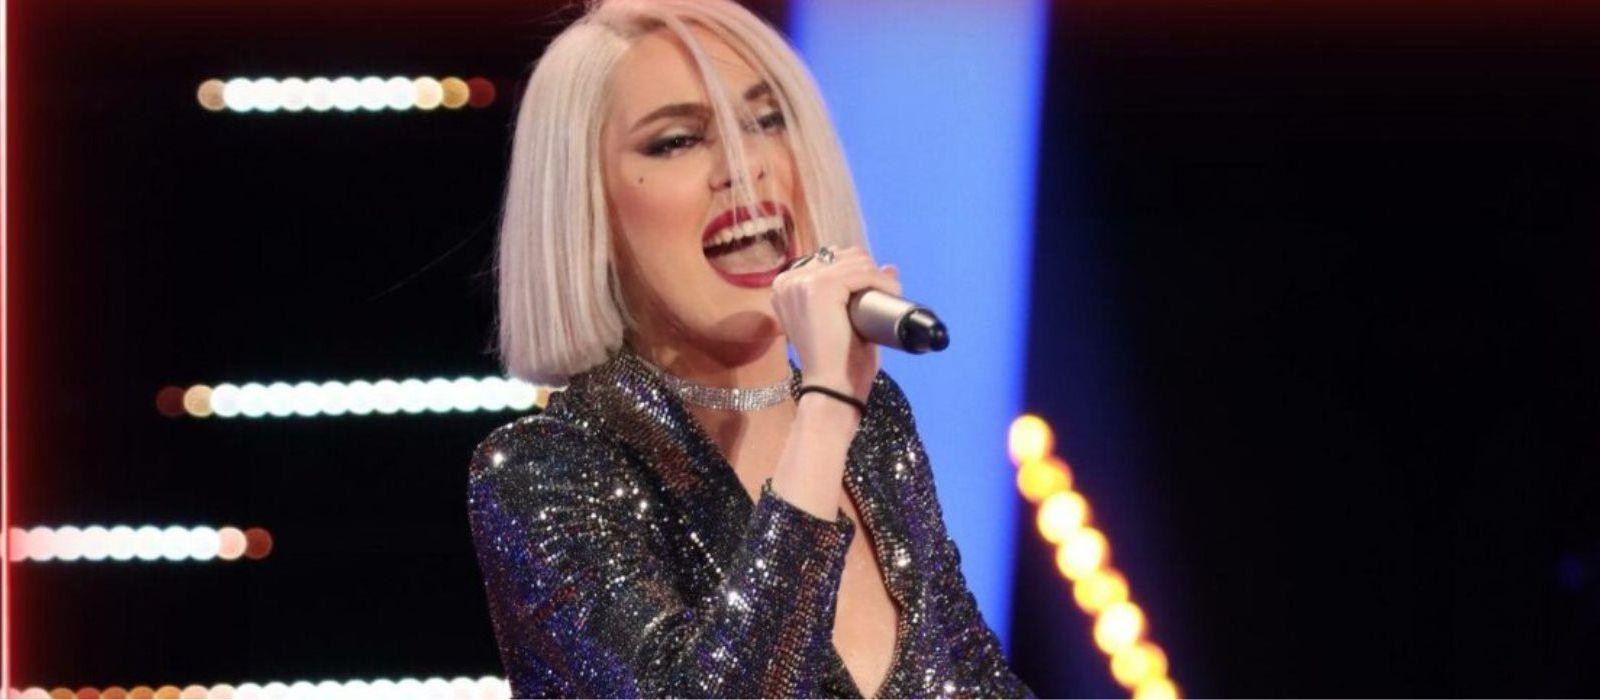 The Voice: Μεγάλη νικήτρια από την ομάδα της Έλενας Παπαρίζου, η Ιωάννα Γεωργακοπούλου [vids]